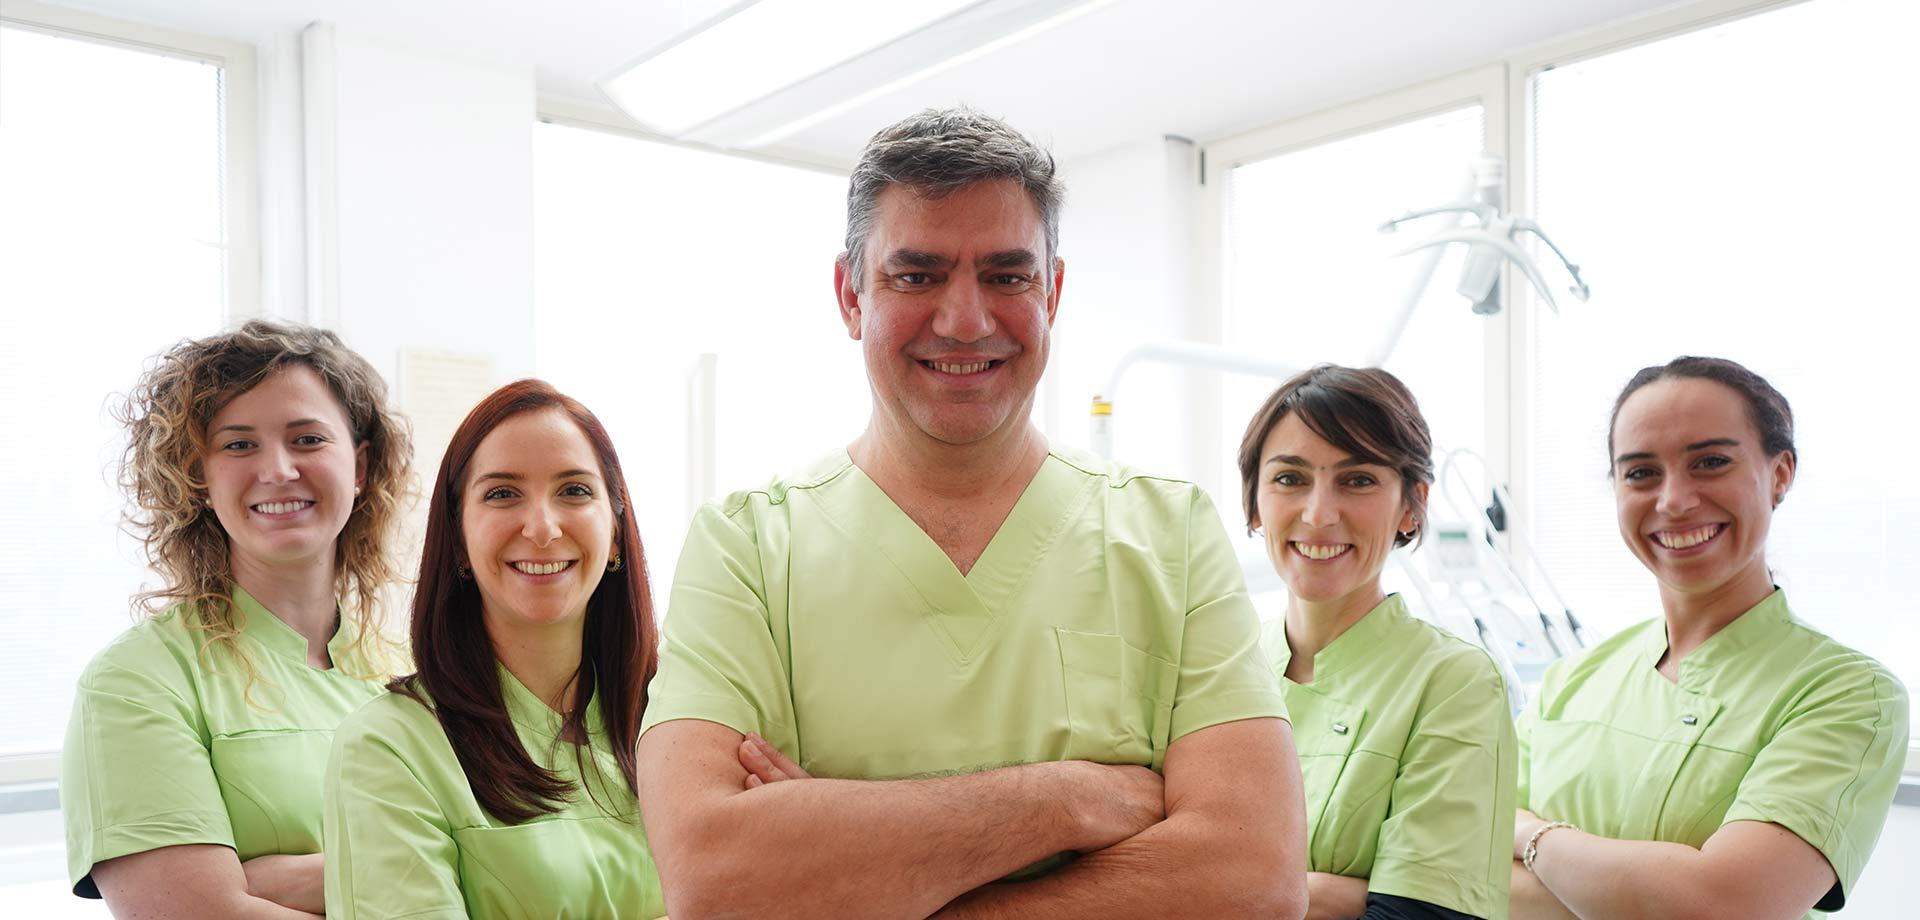 Home - Tomezzoli Odontoiatria